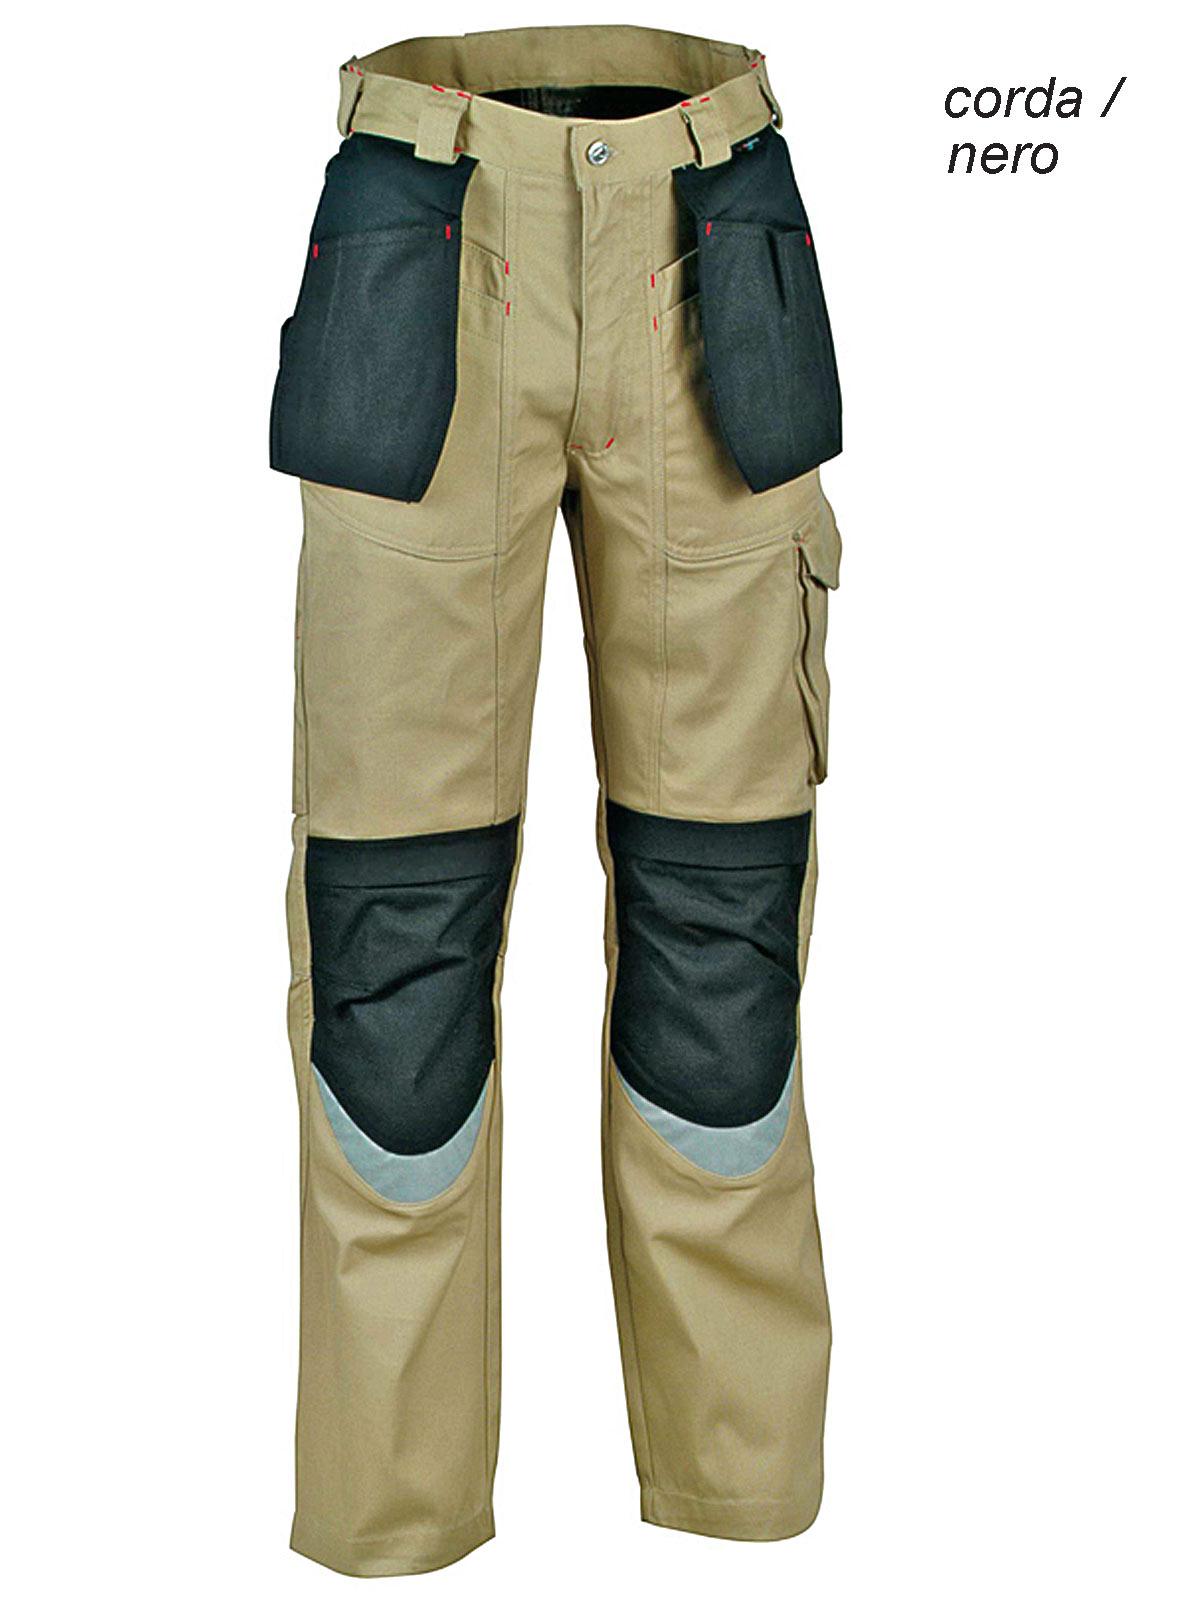 Gilet invernale Cofra POLAR colore: blu navy//nero da lavoro